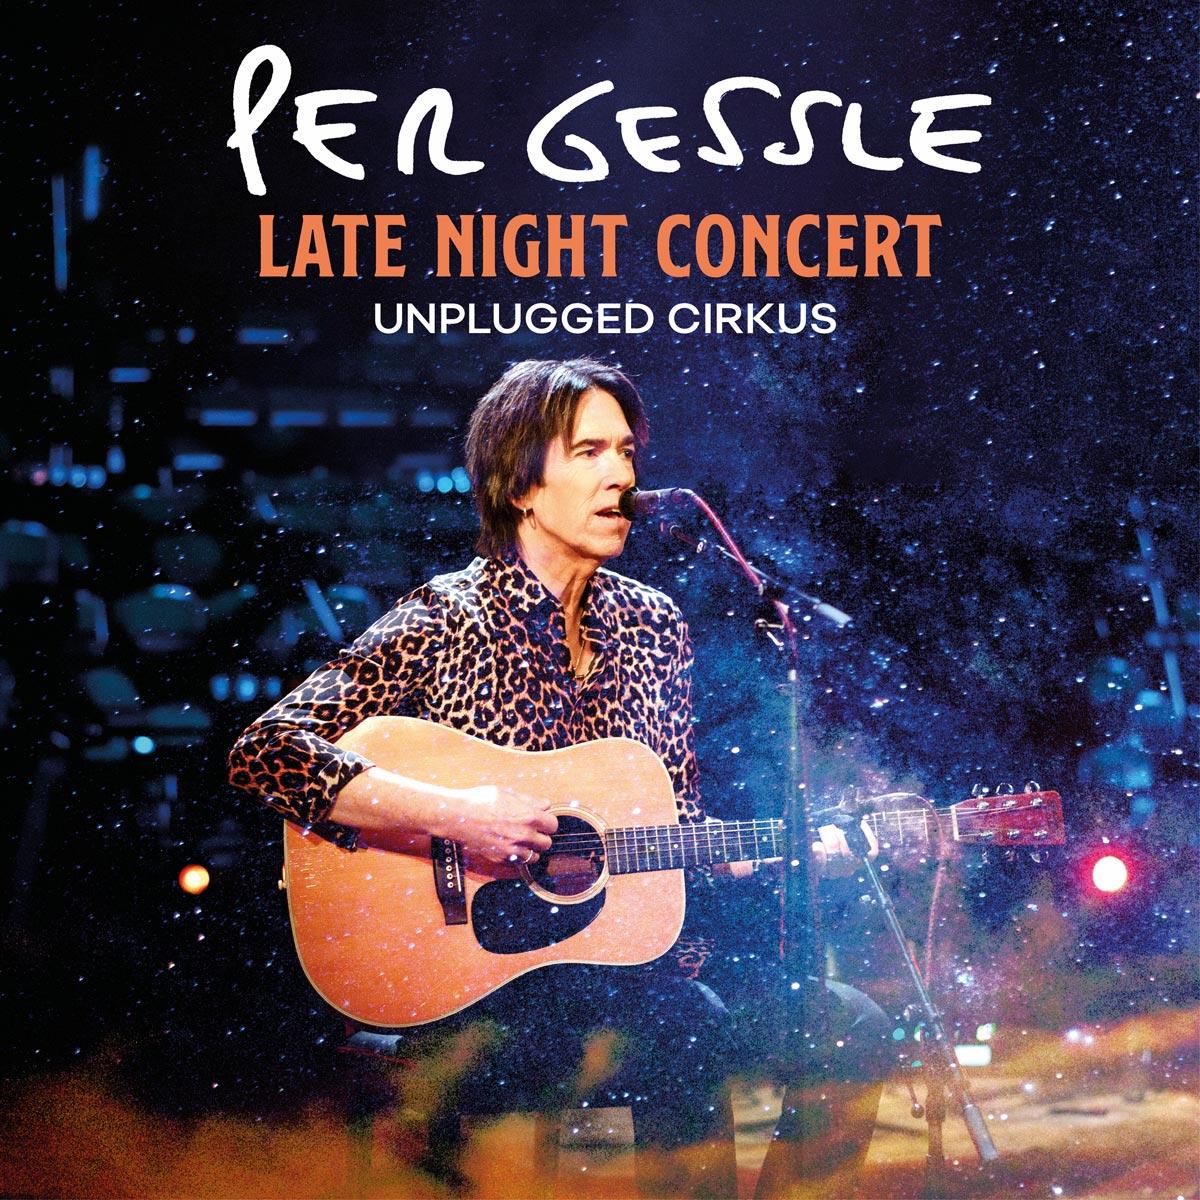 Late Night Concert - Unplugged Cirkus - Per Gessle - Musik -  - 7332334442090 - January 29, 2021